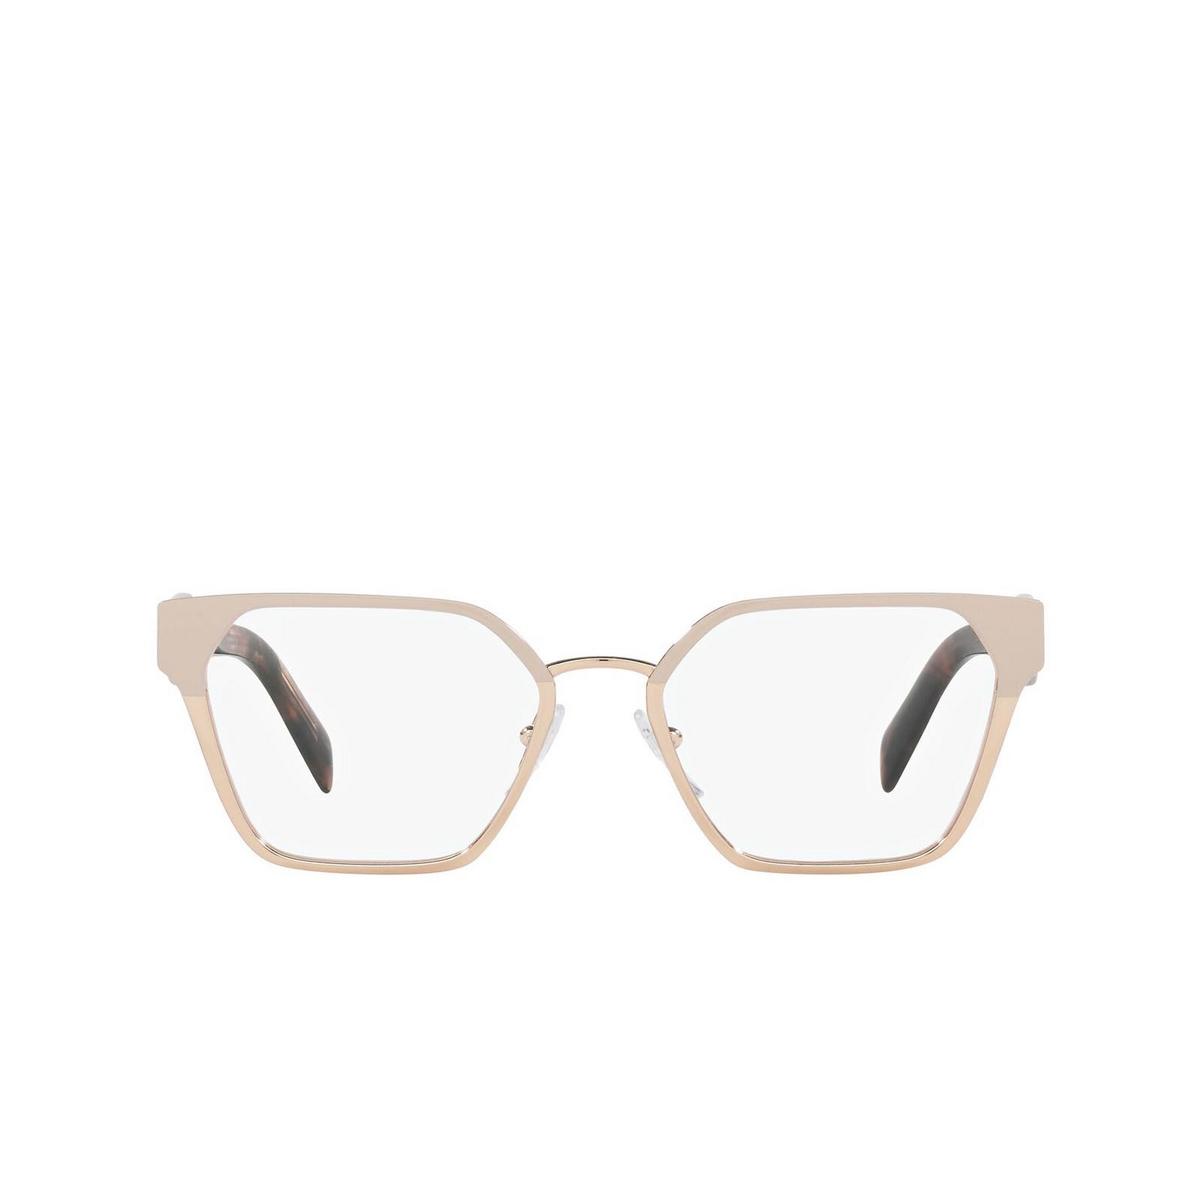 Prada® Irregular Eyeglasses: PR 63WV color Powder/ Pink Gold 05L1O1 - front view.